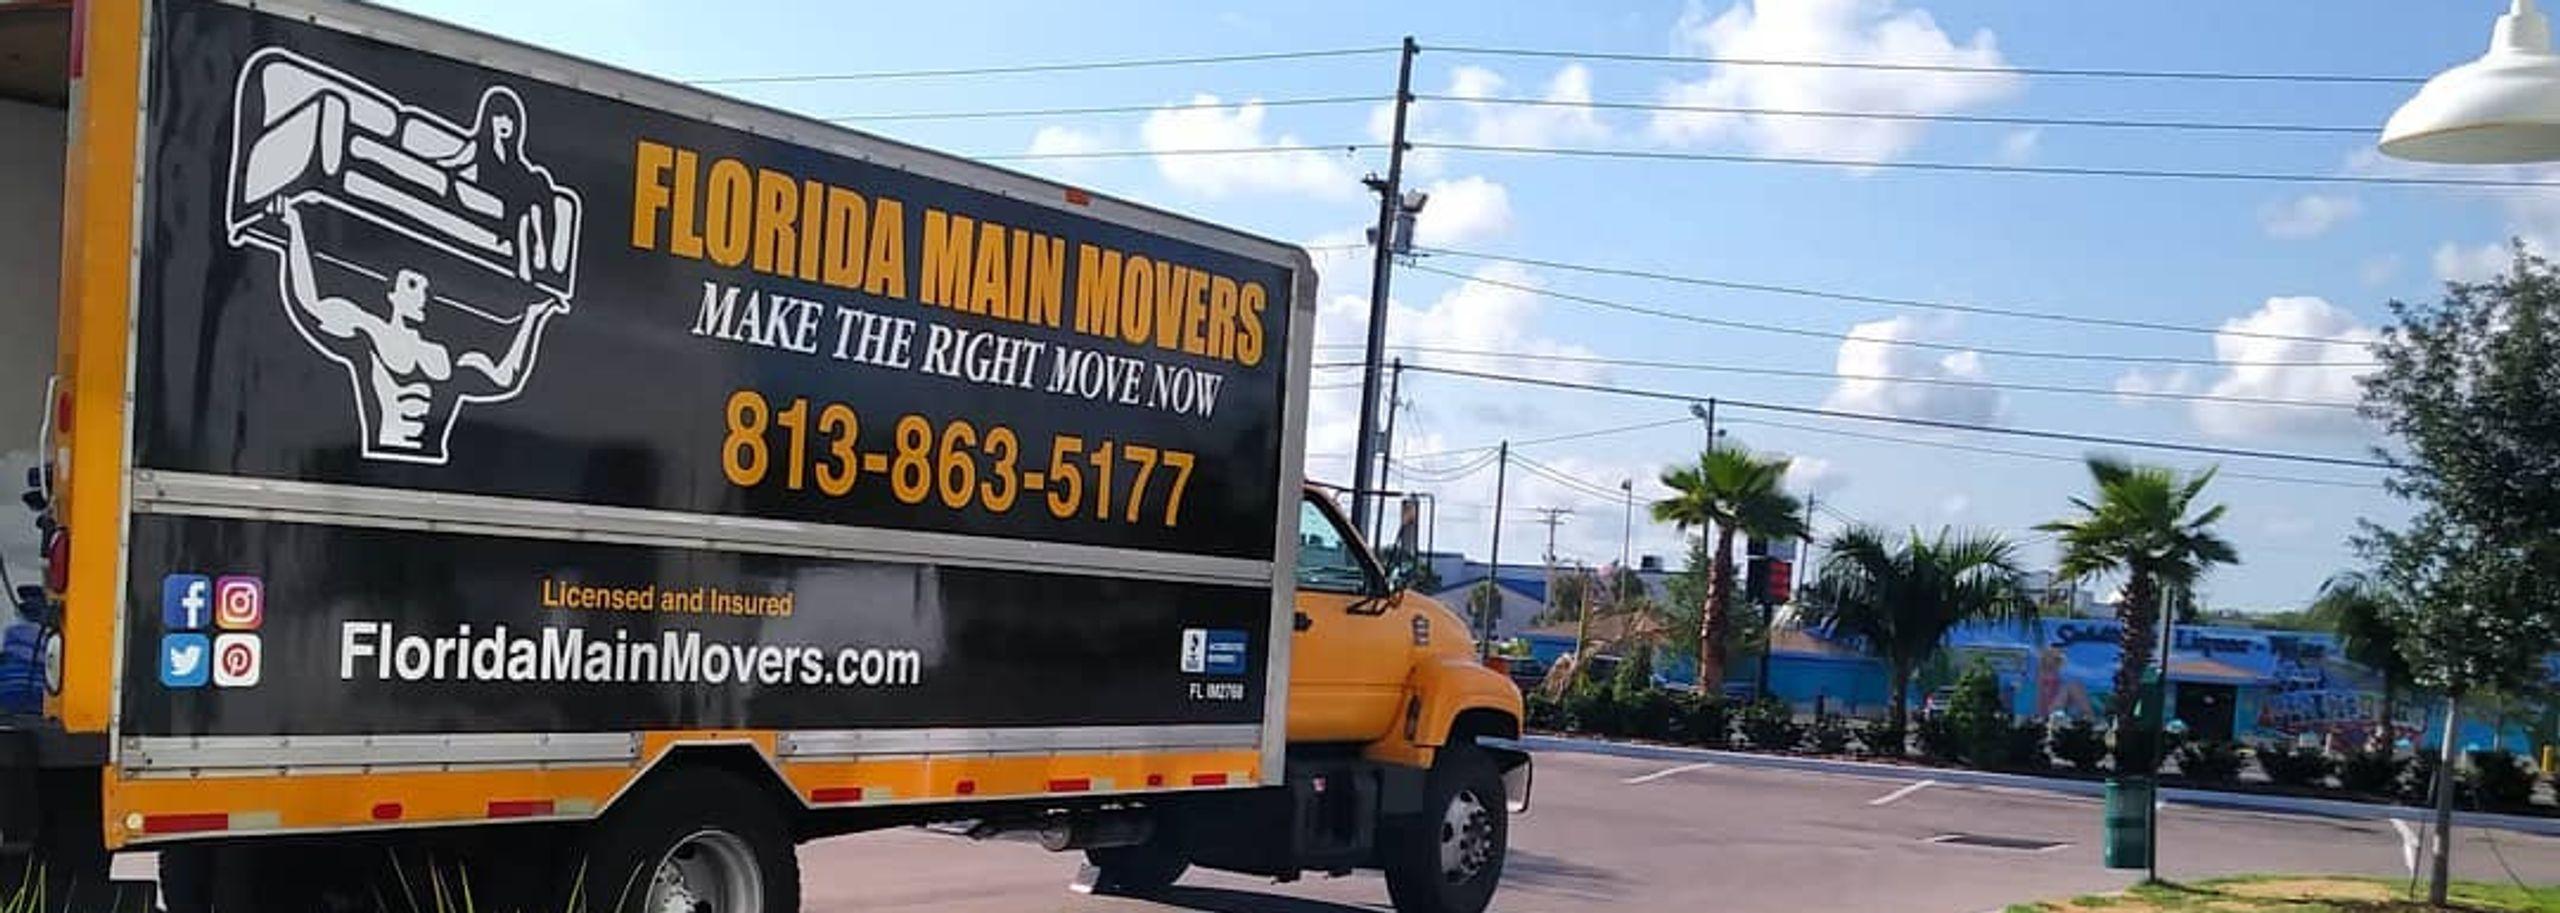 Florida Main Movers Truck